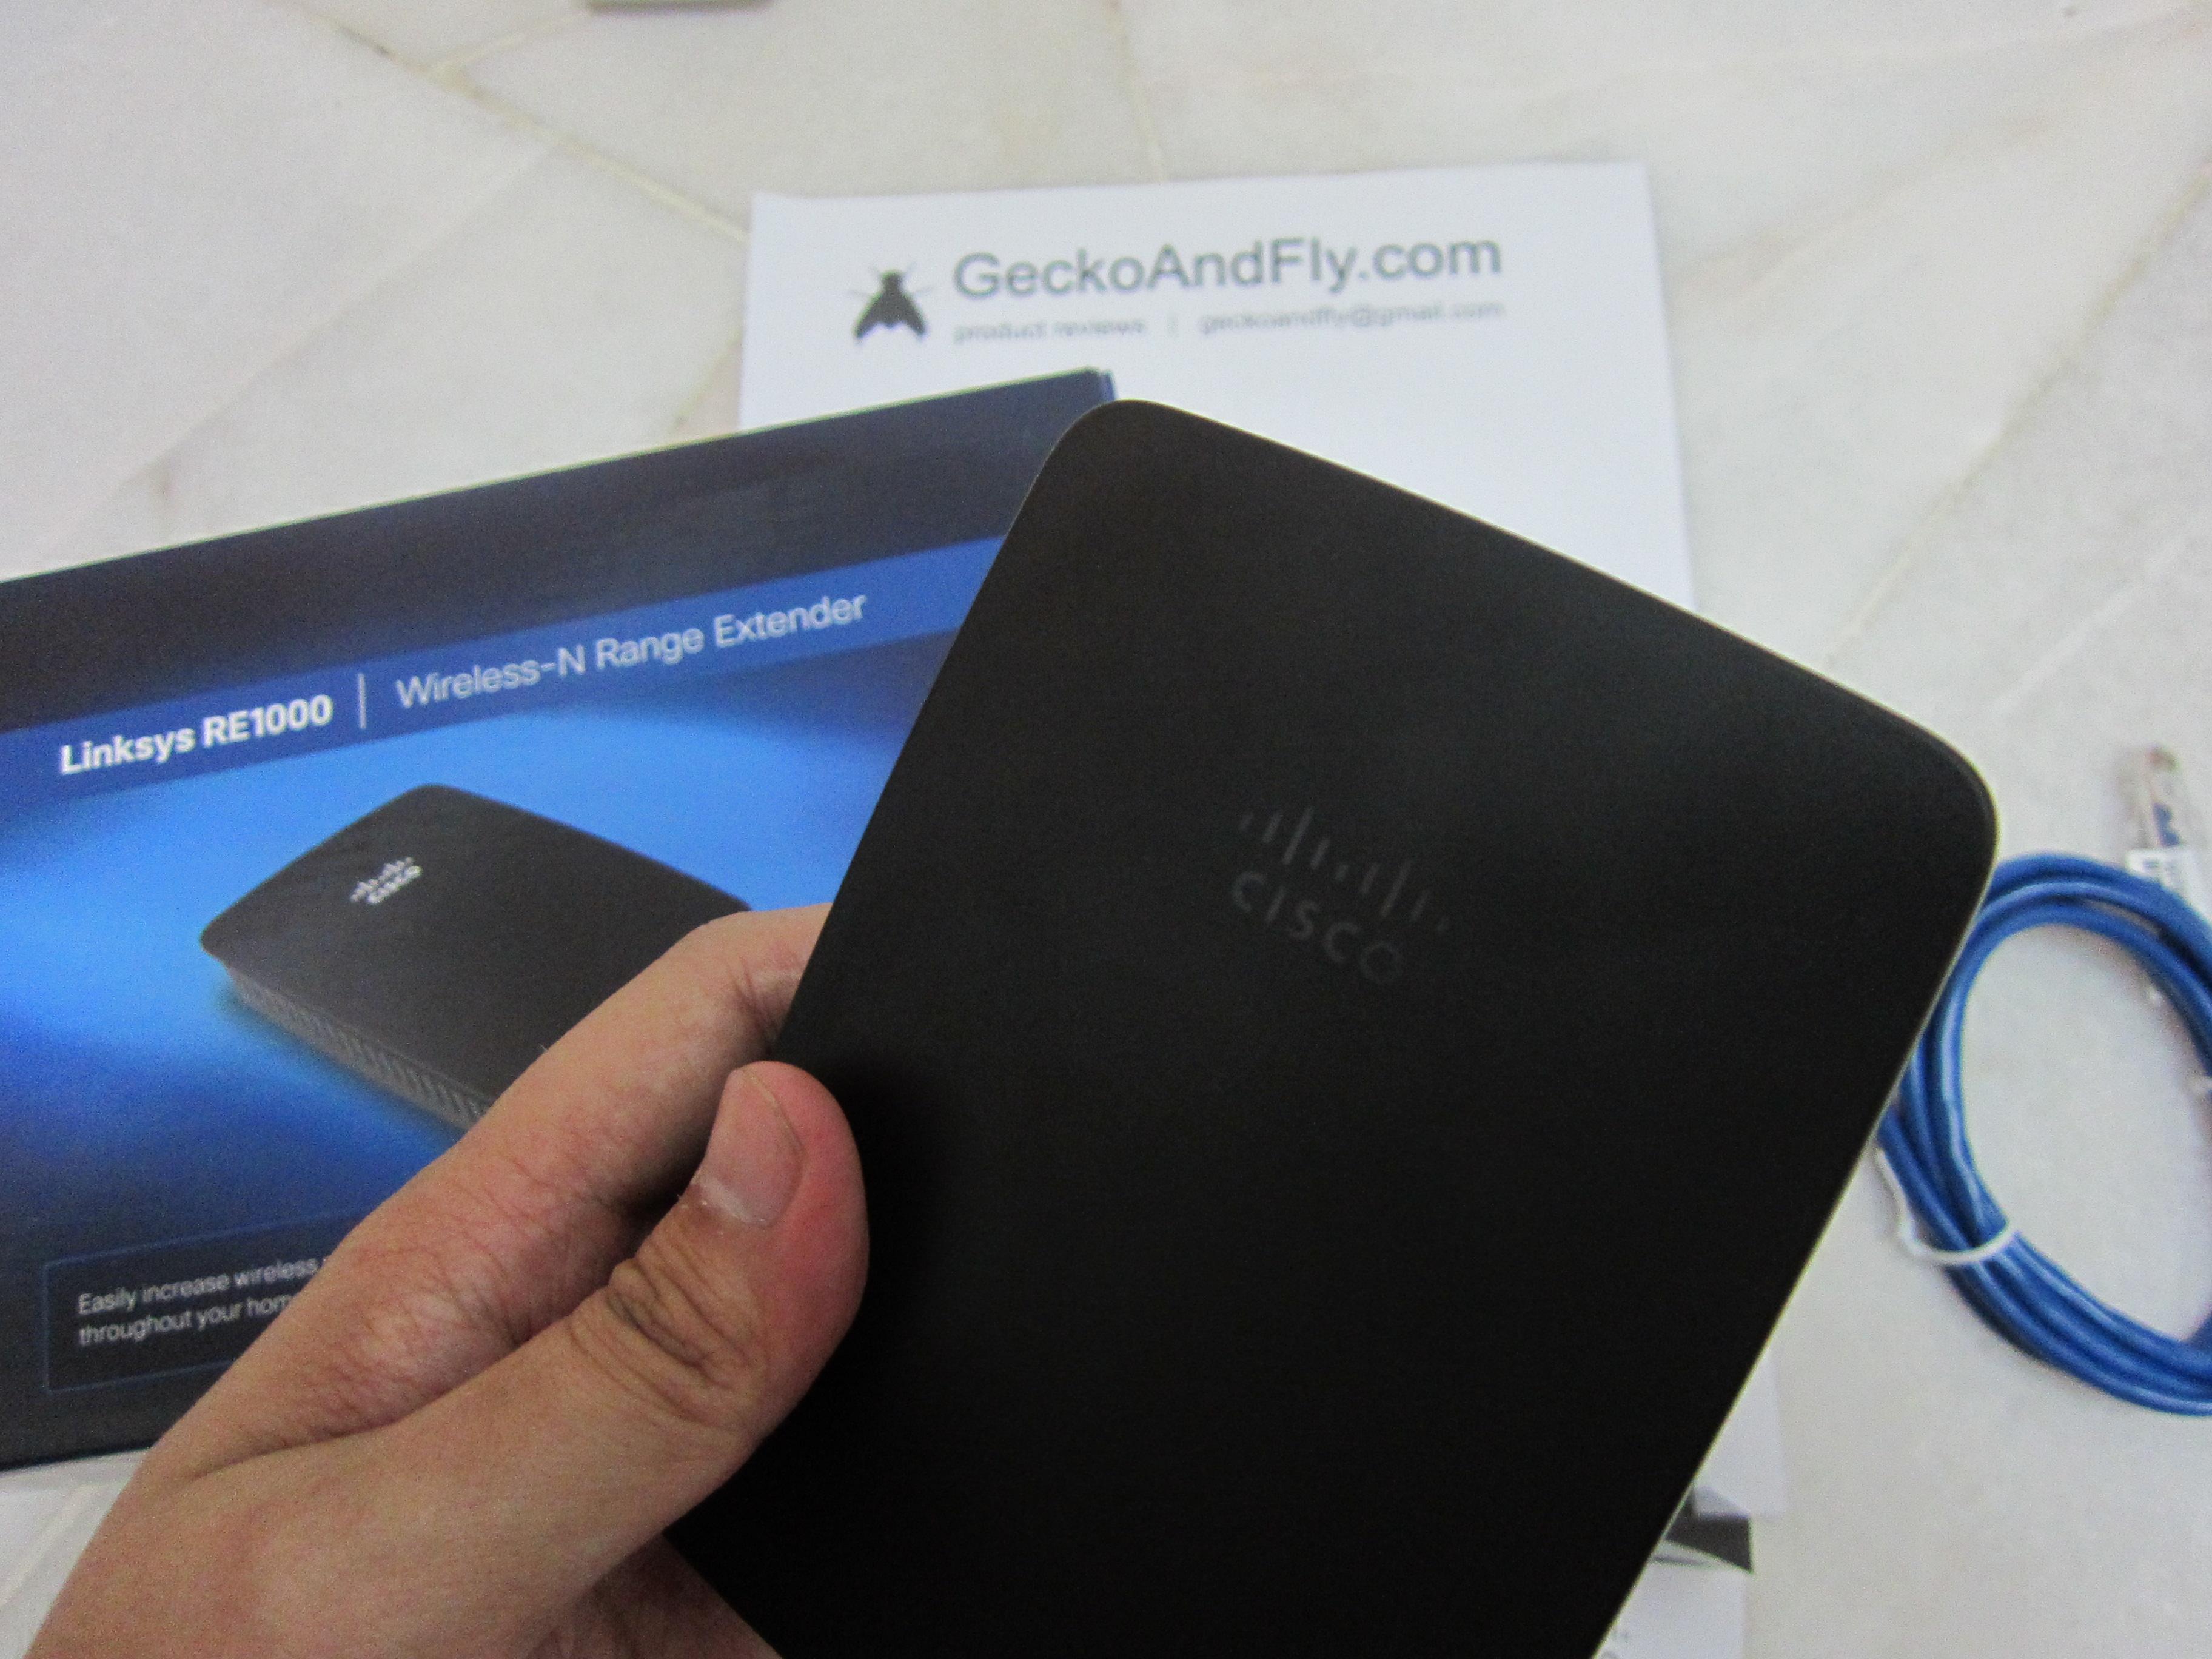 cisco wifi extender re1000 manual